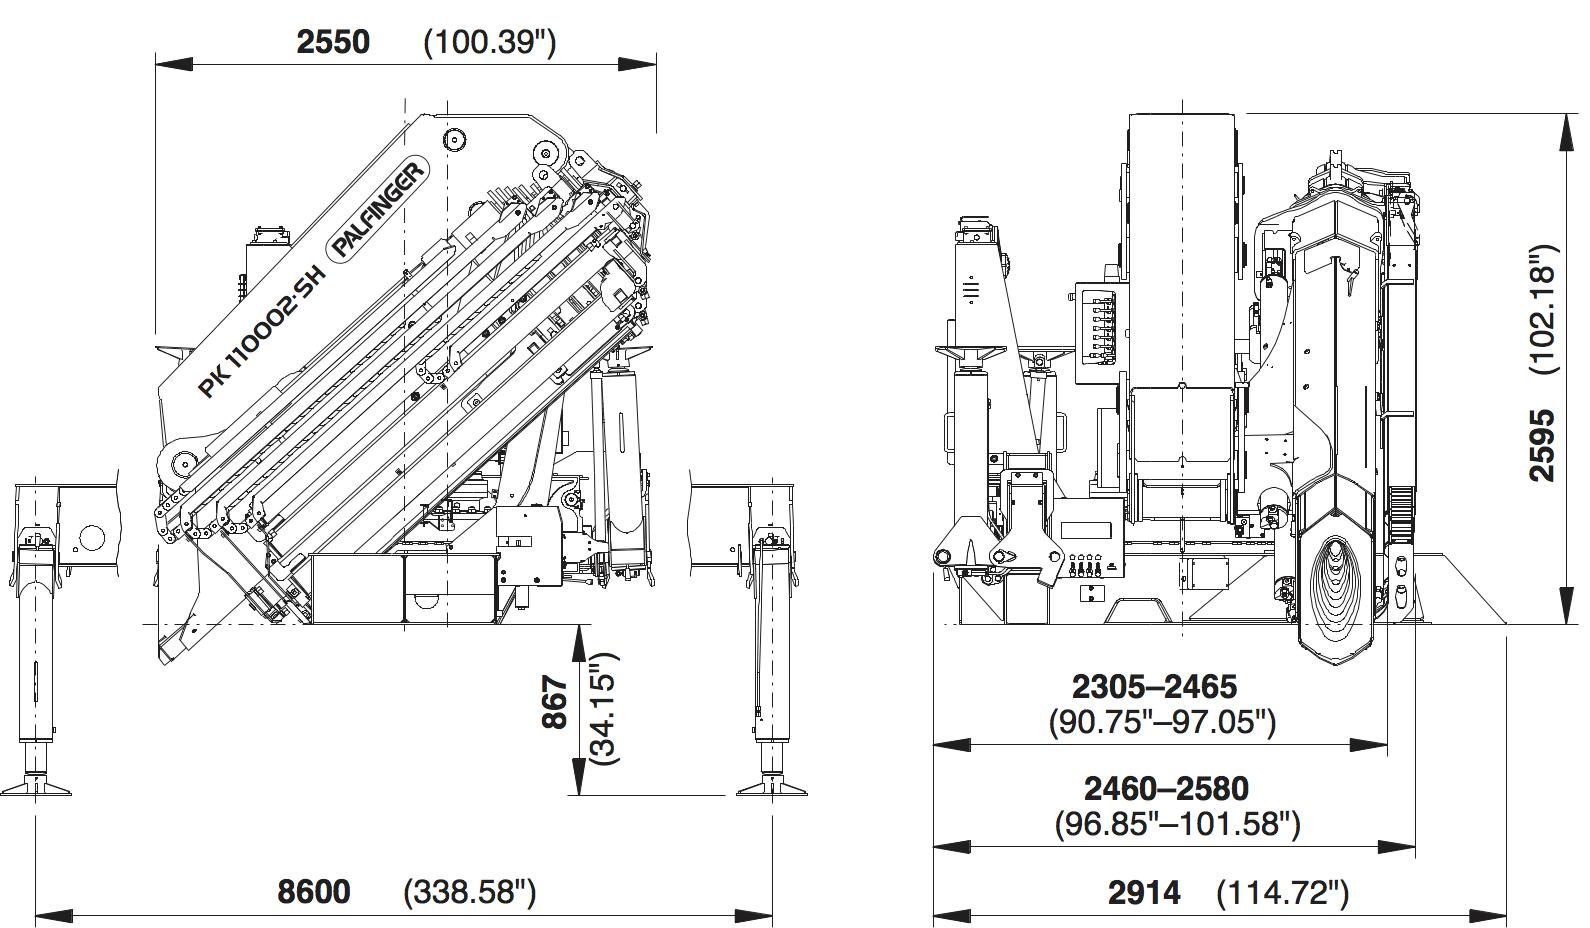 mbb interlift wiring diagram freightliner wiring diagram